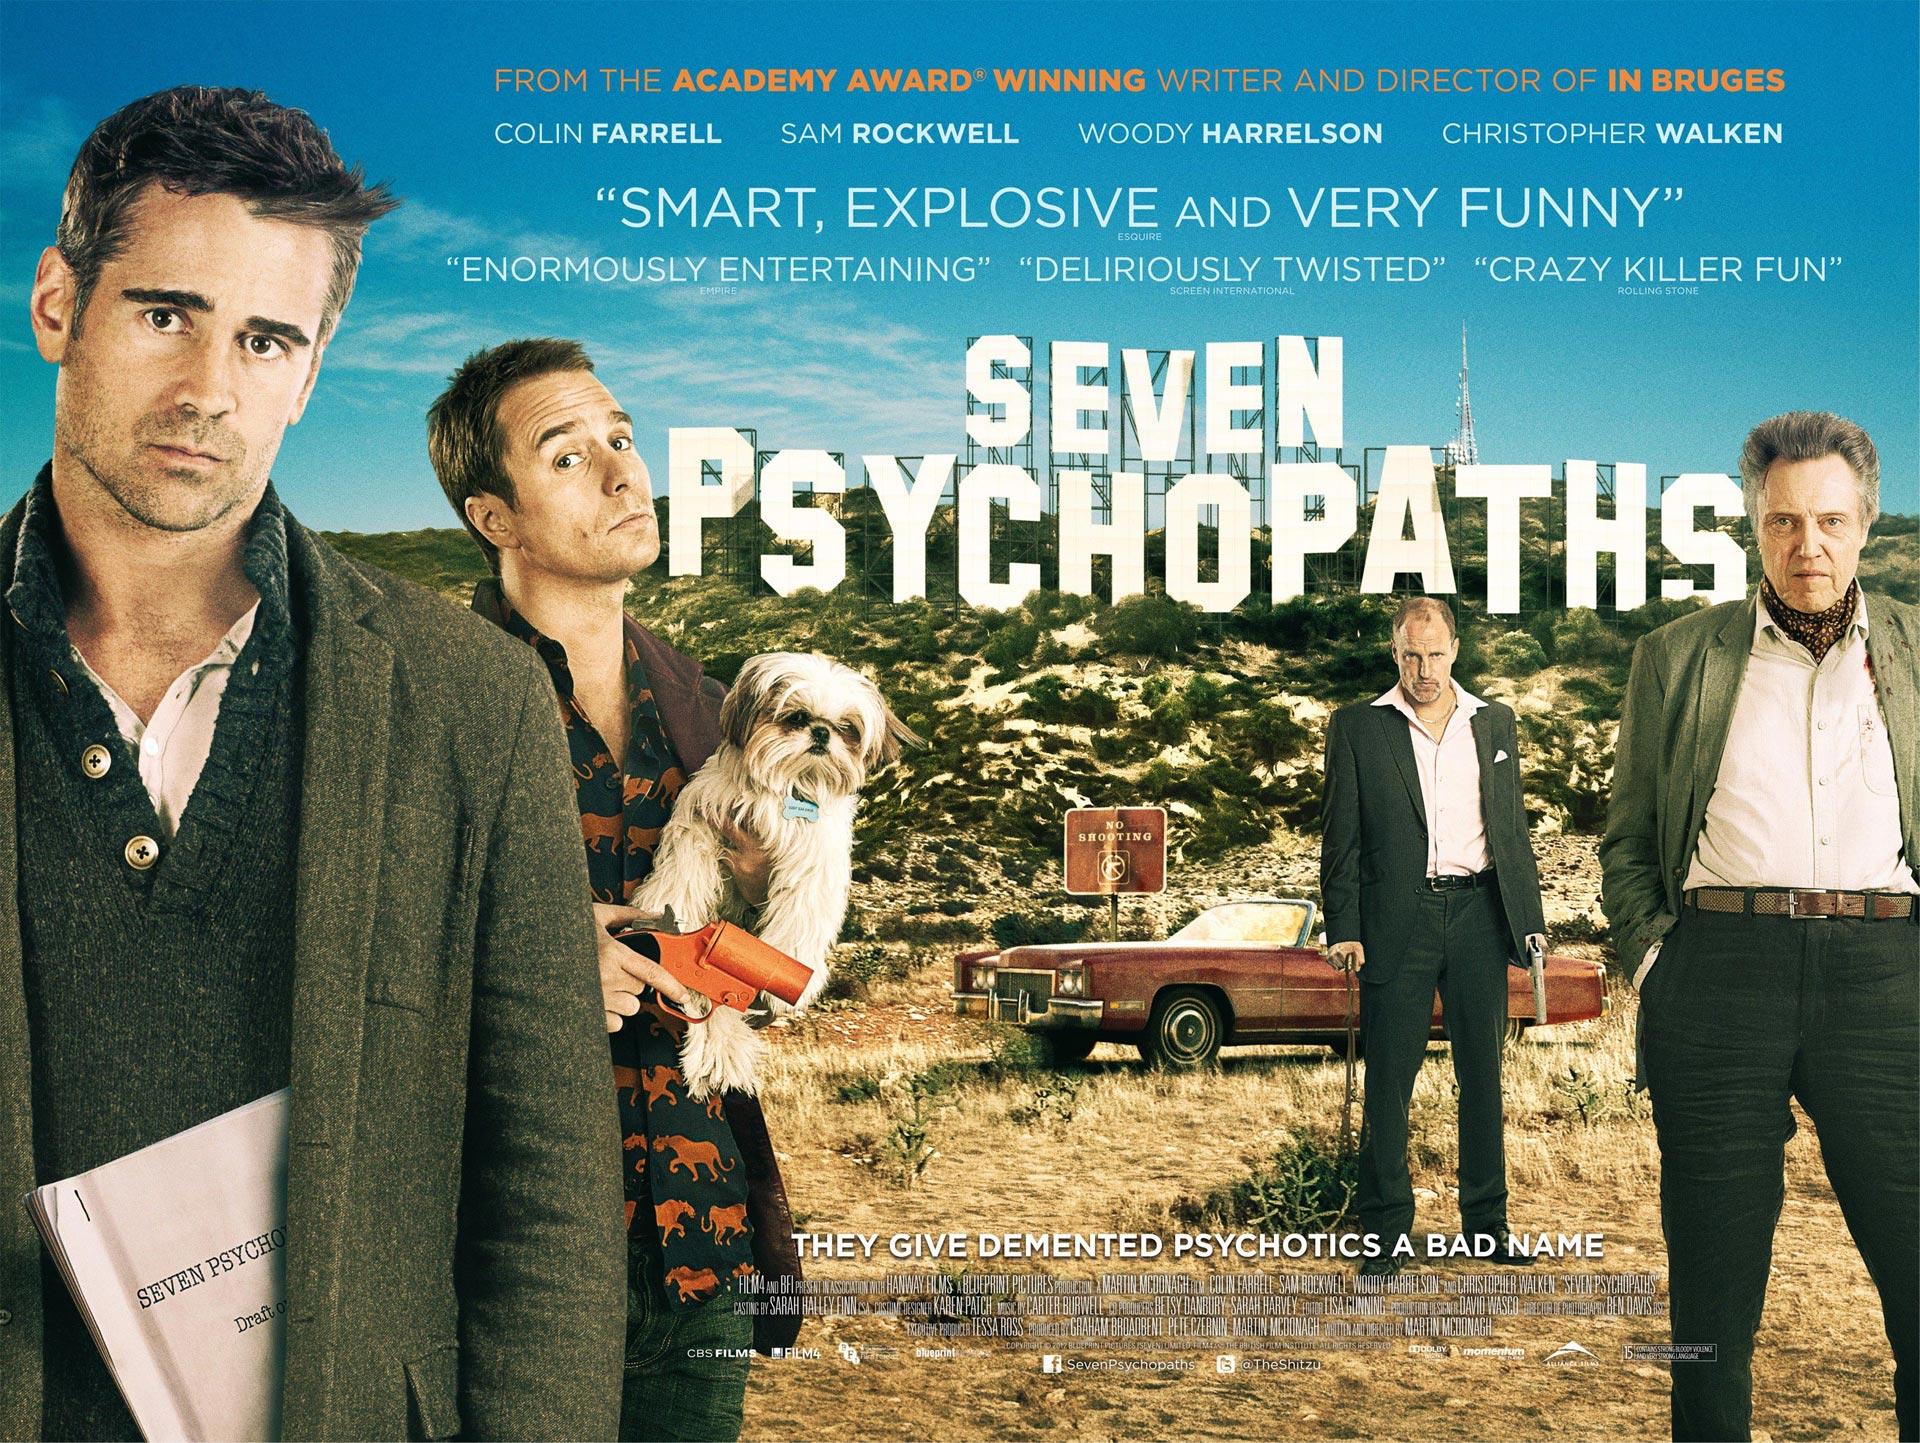 http://www.filmofilia.com/wp-content/uploads/2012/10/Seven-Psychopaths1.jpg